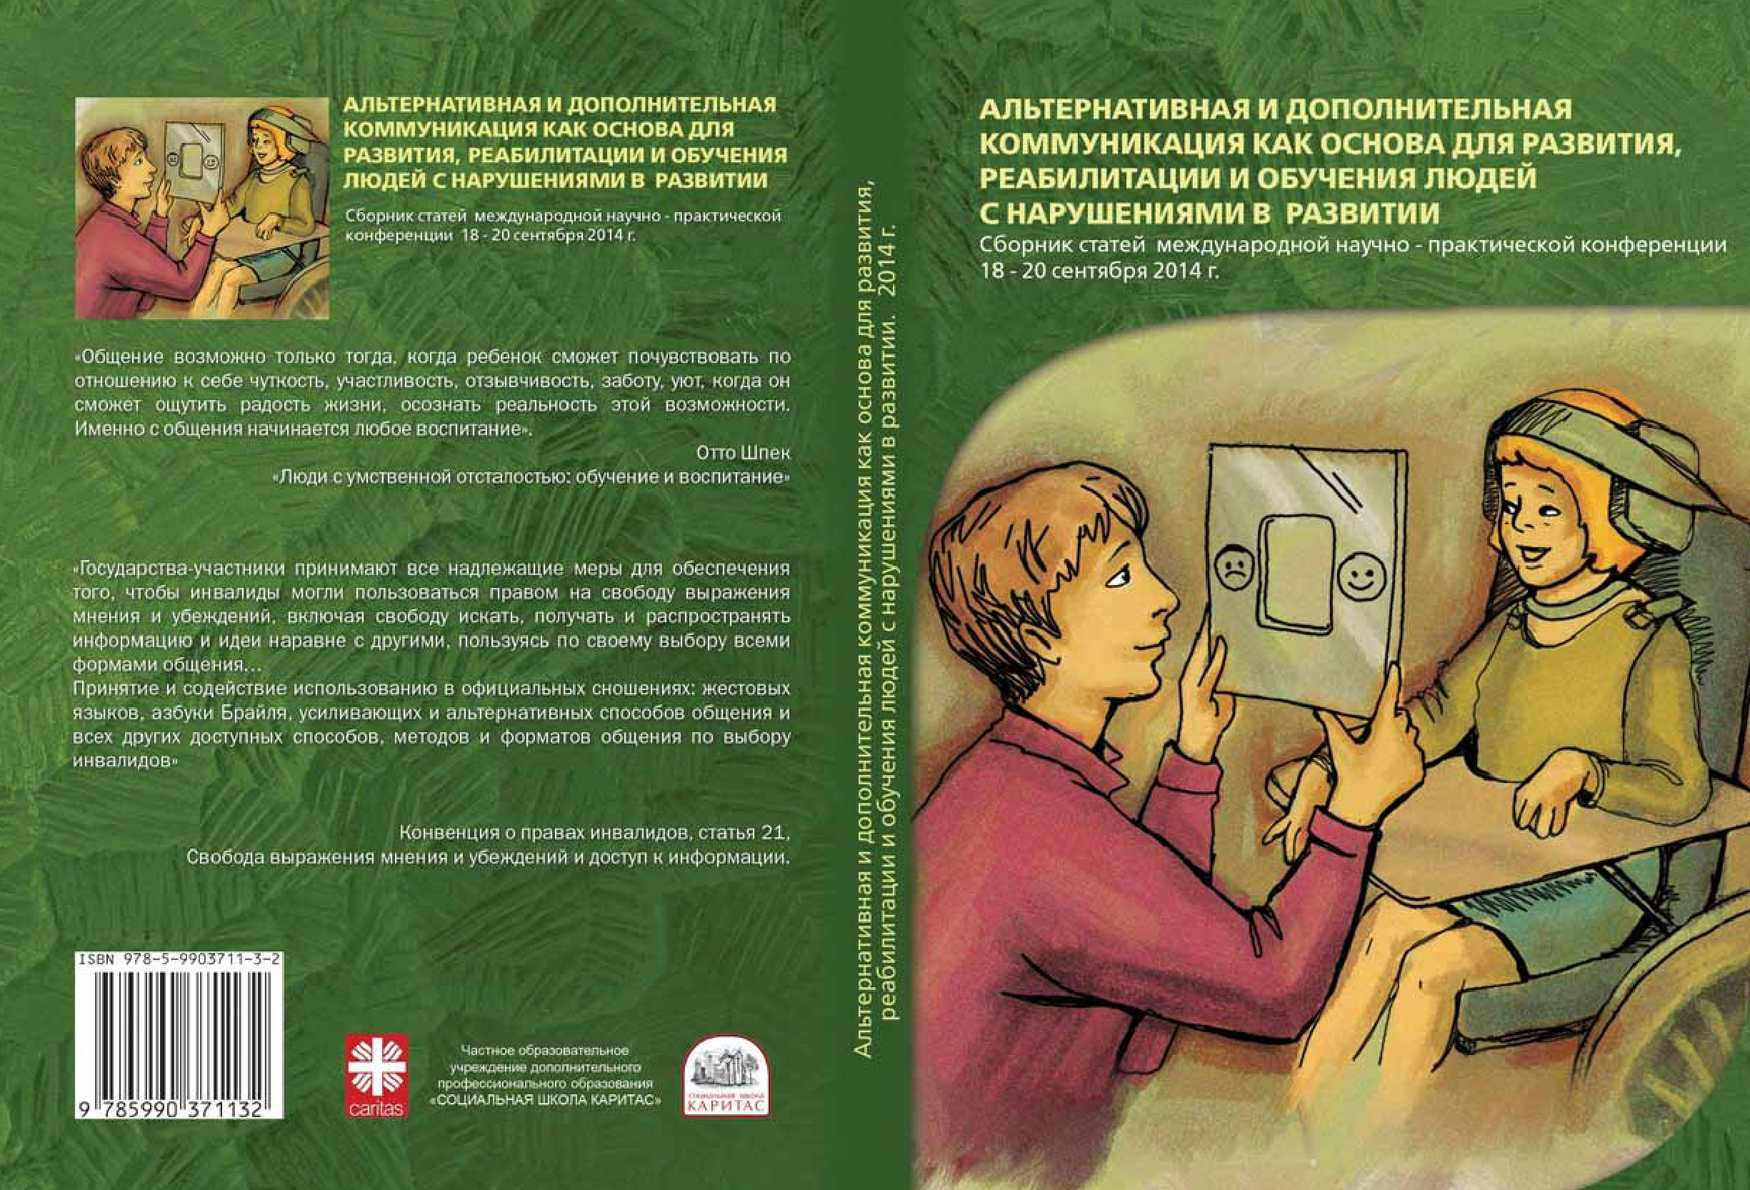 Calaméo - Сборник материалов конференции 18-20.09.14 86bf89f862f